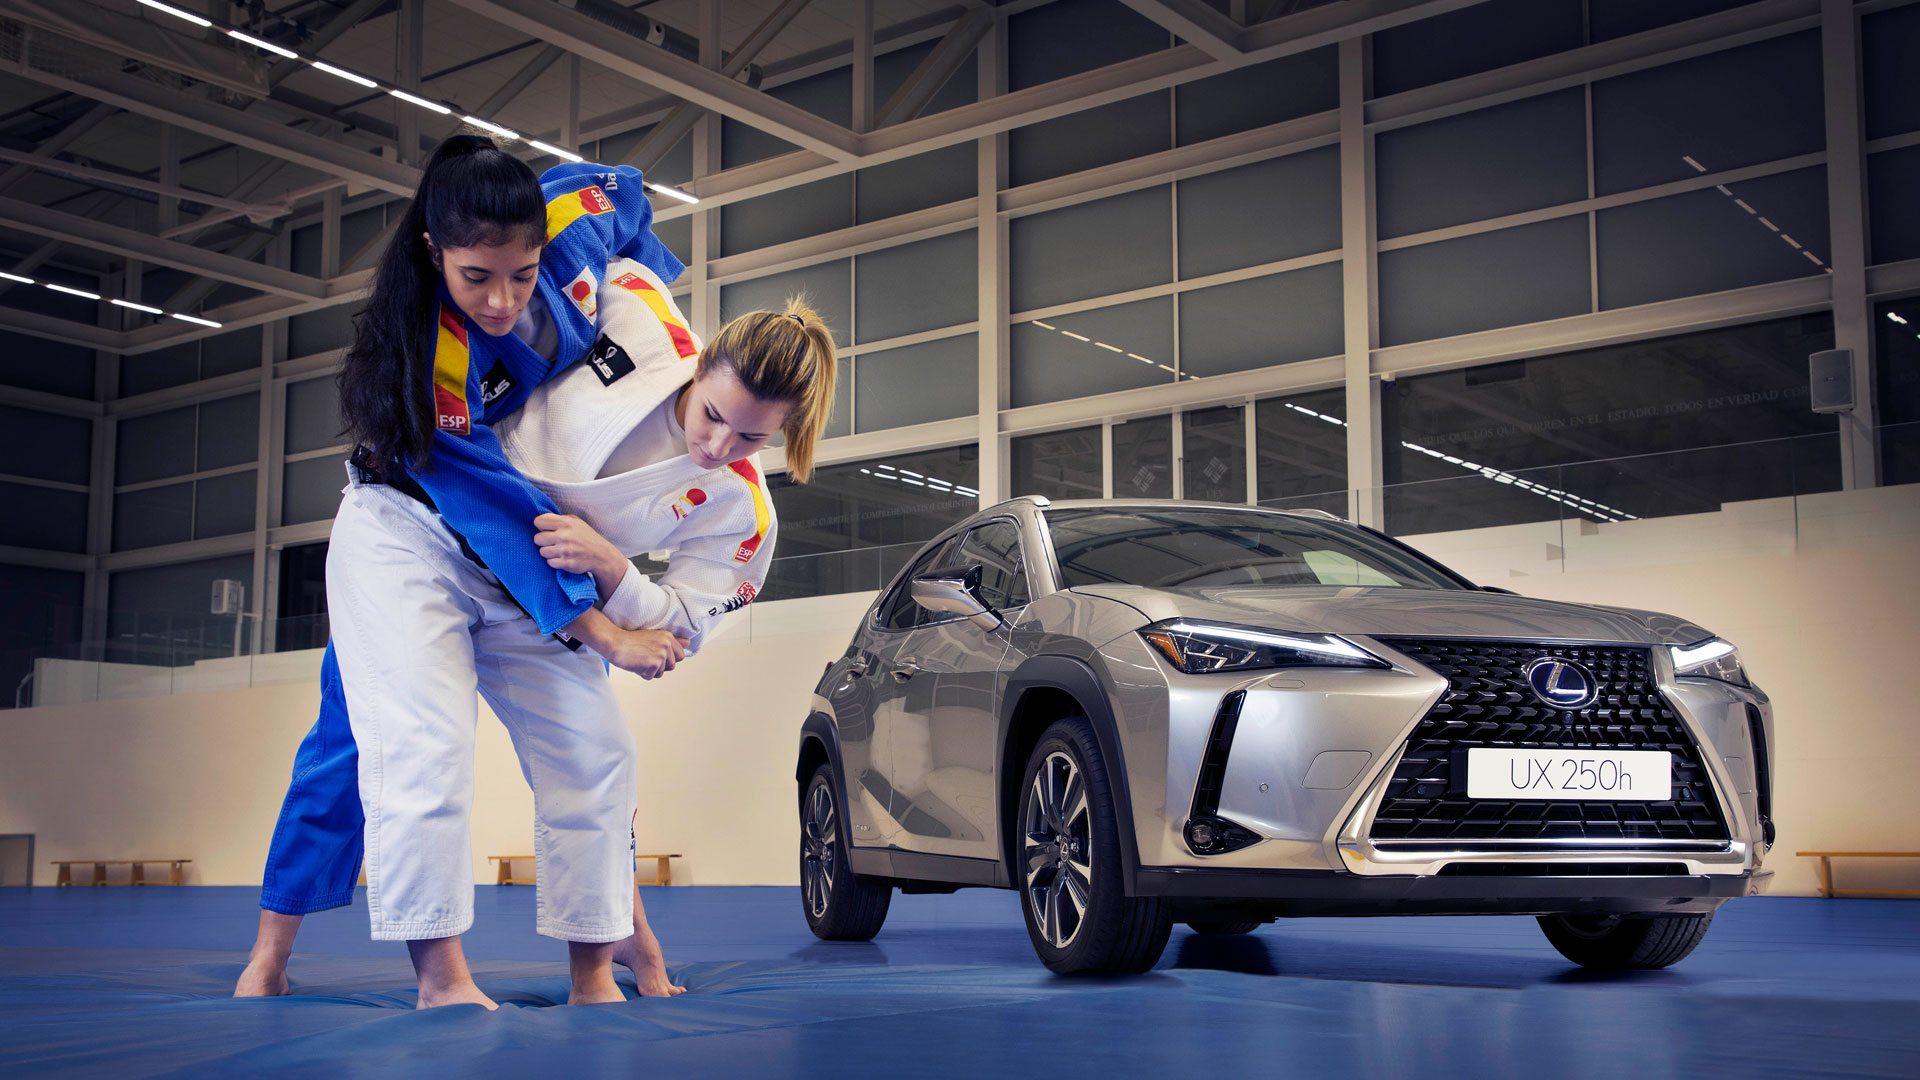 Imagen de judokas junto al Lexus UX 250h